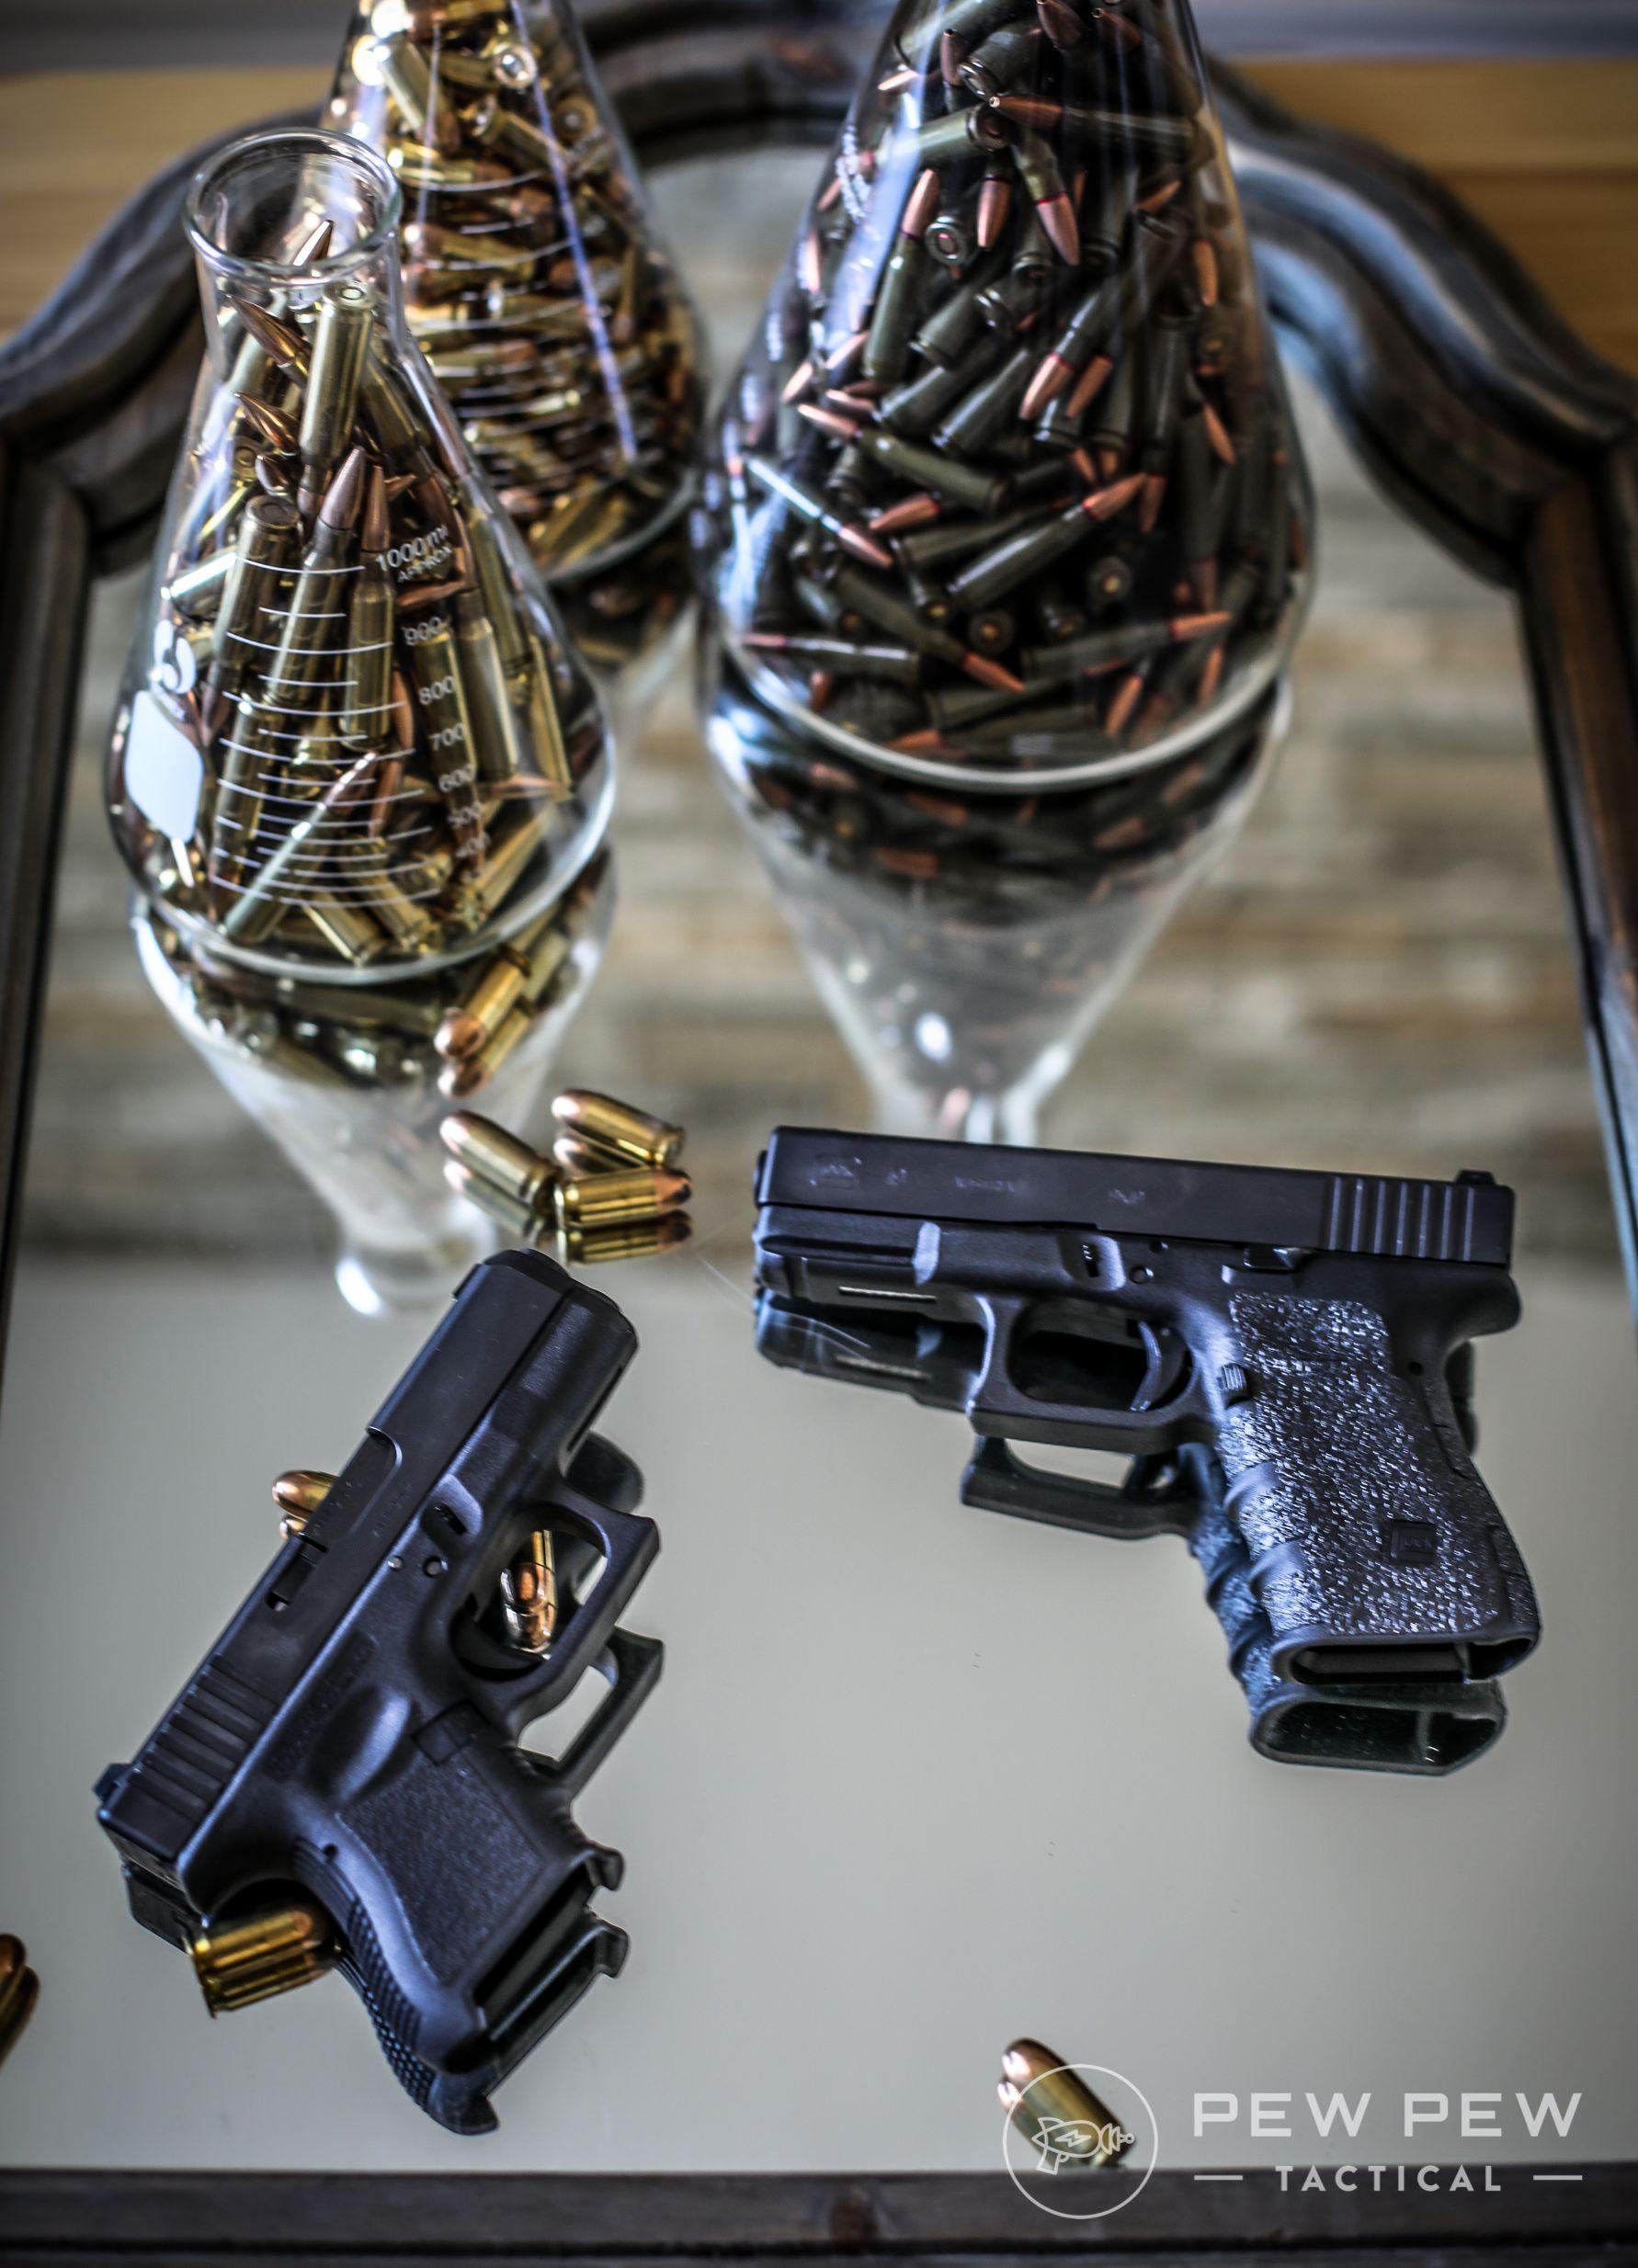 Best Handgun For Beginners Home Defense 2019 Self